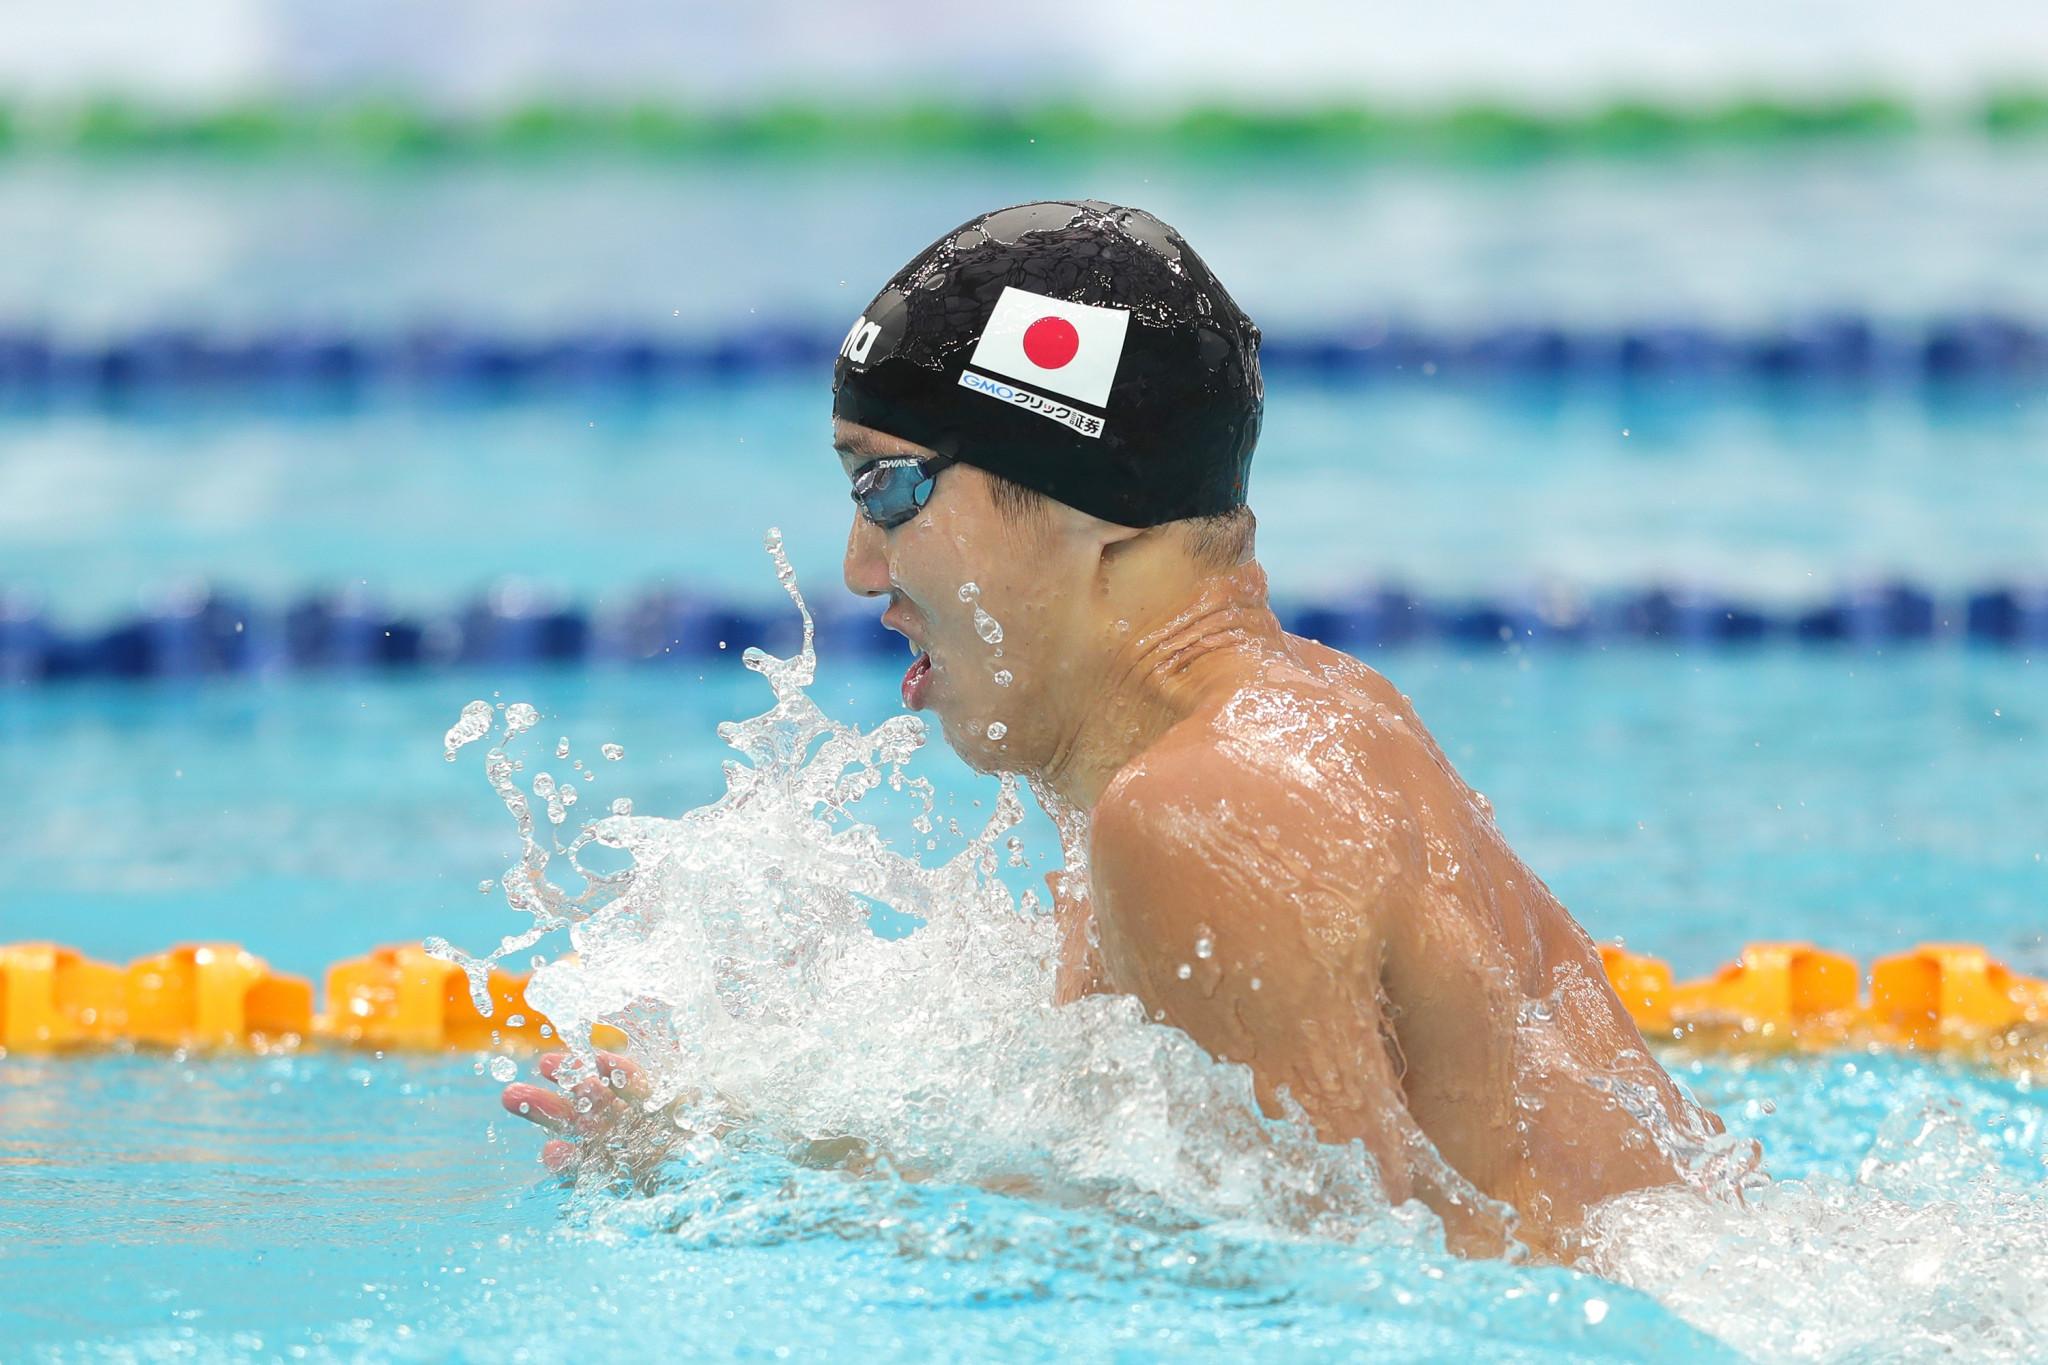 Japanese swimmer Hiromasa Fujimori to miss Tokyo 2020 as CAS upholds doping ban